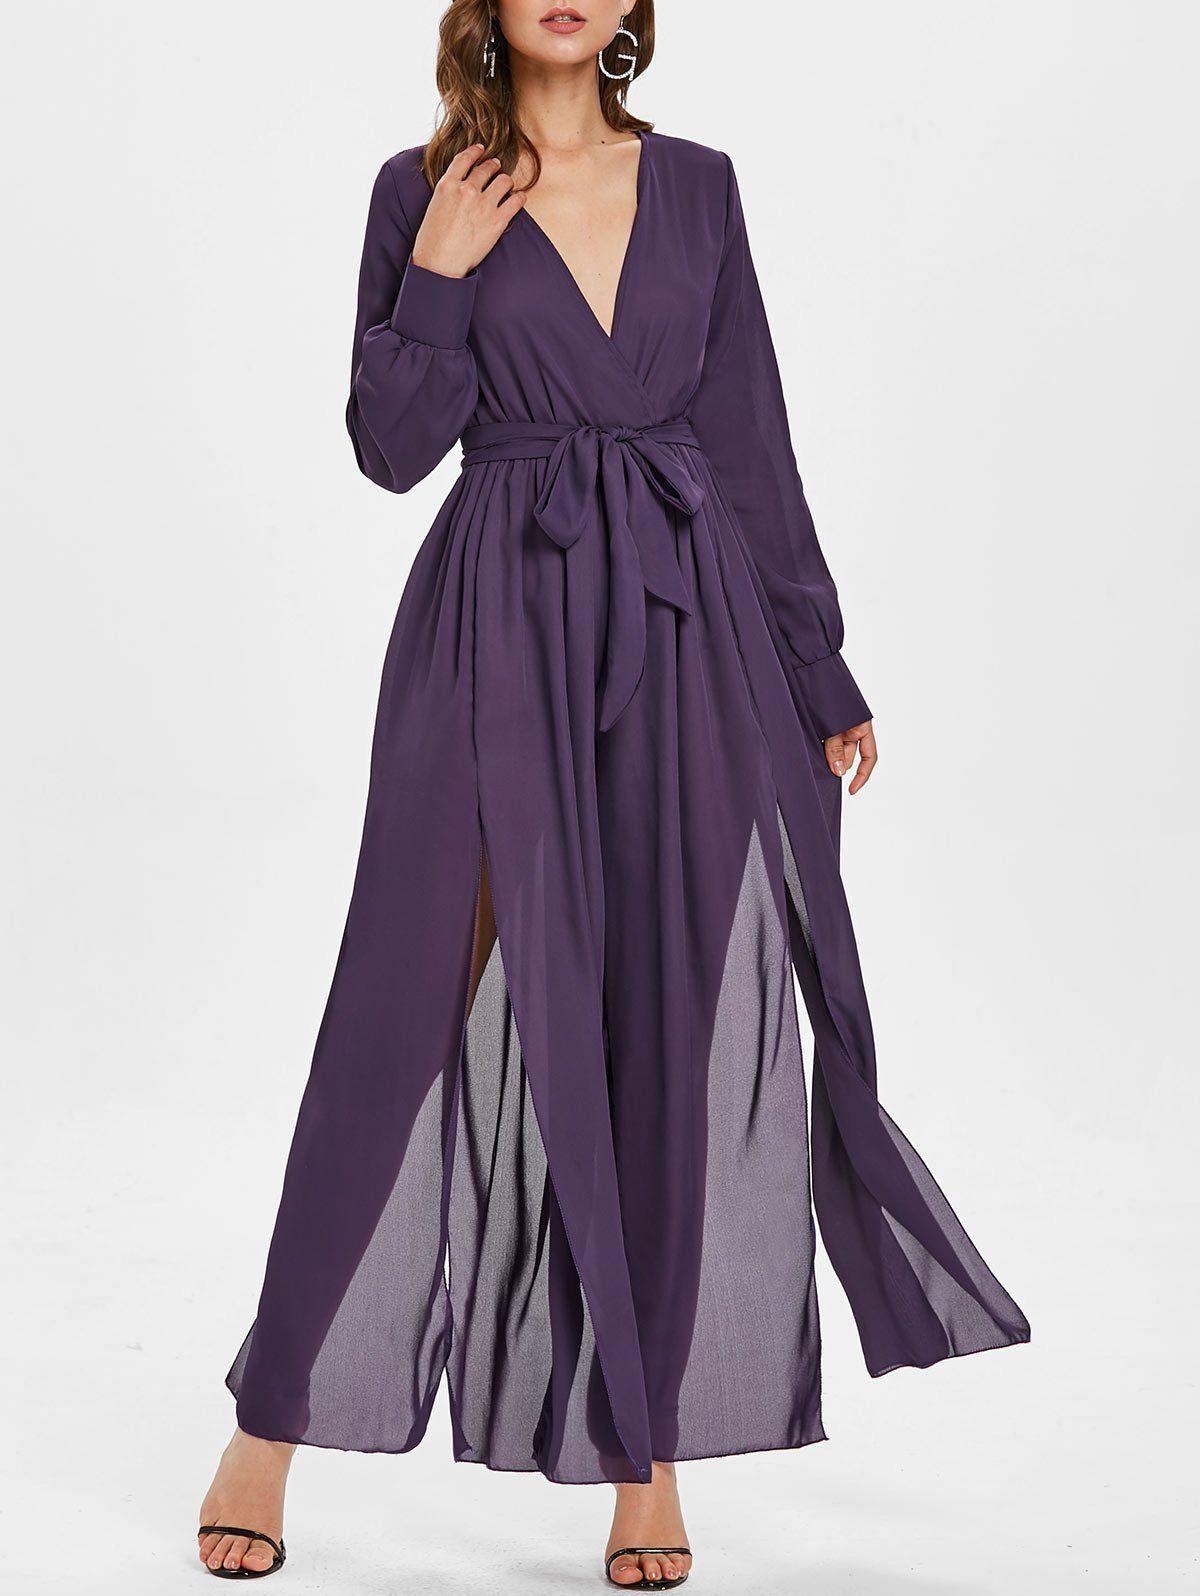 Plunging Neckline High Slit Wide Leg Maxi Jumpsuit – Purple Amethyst – S